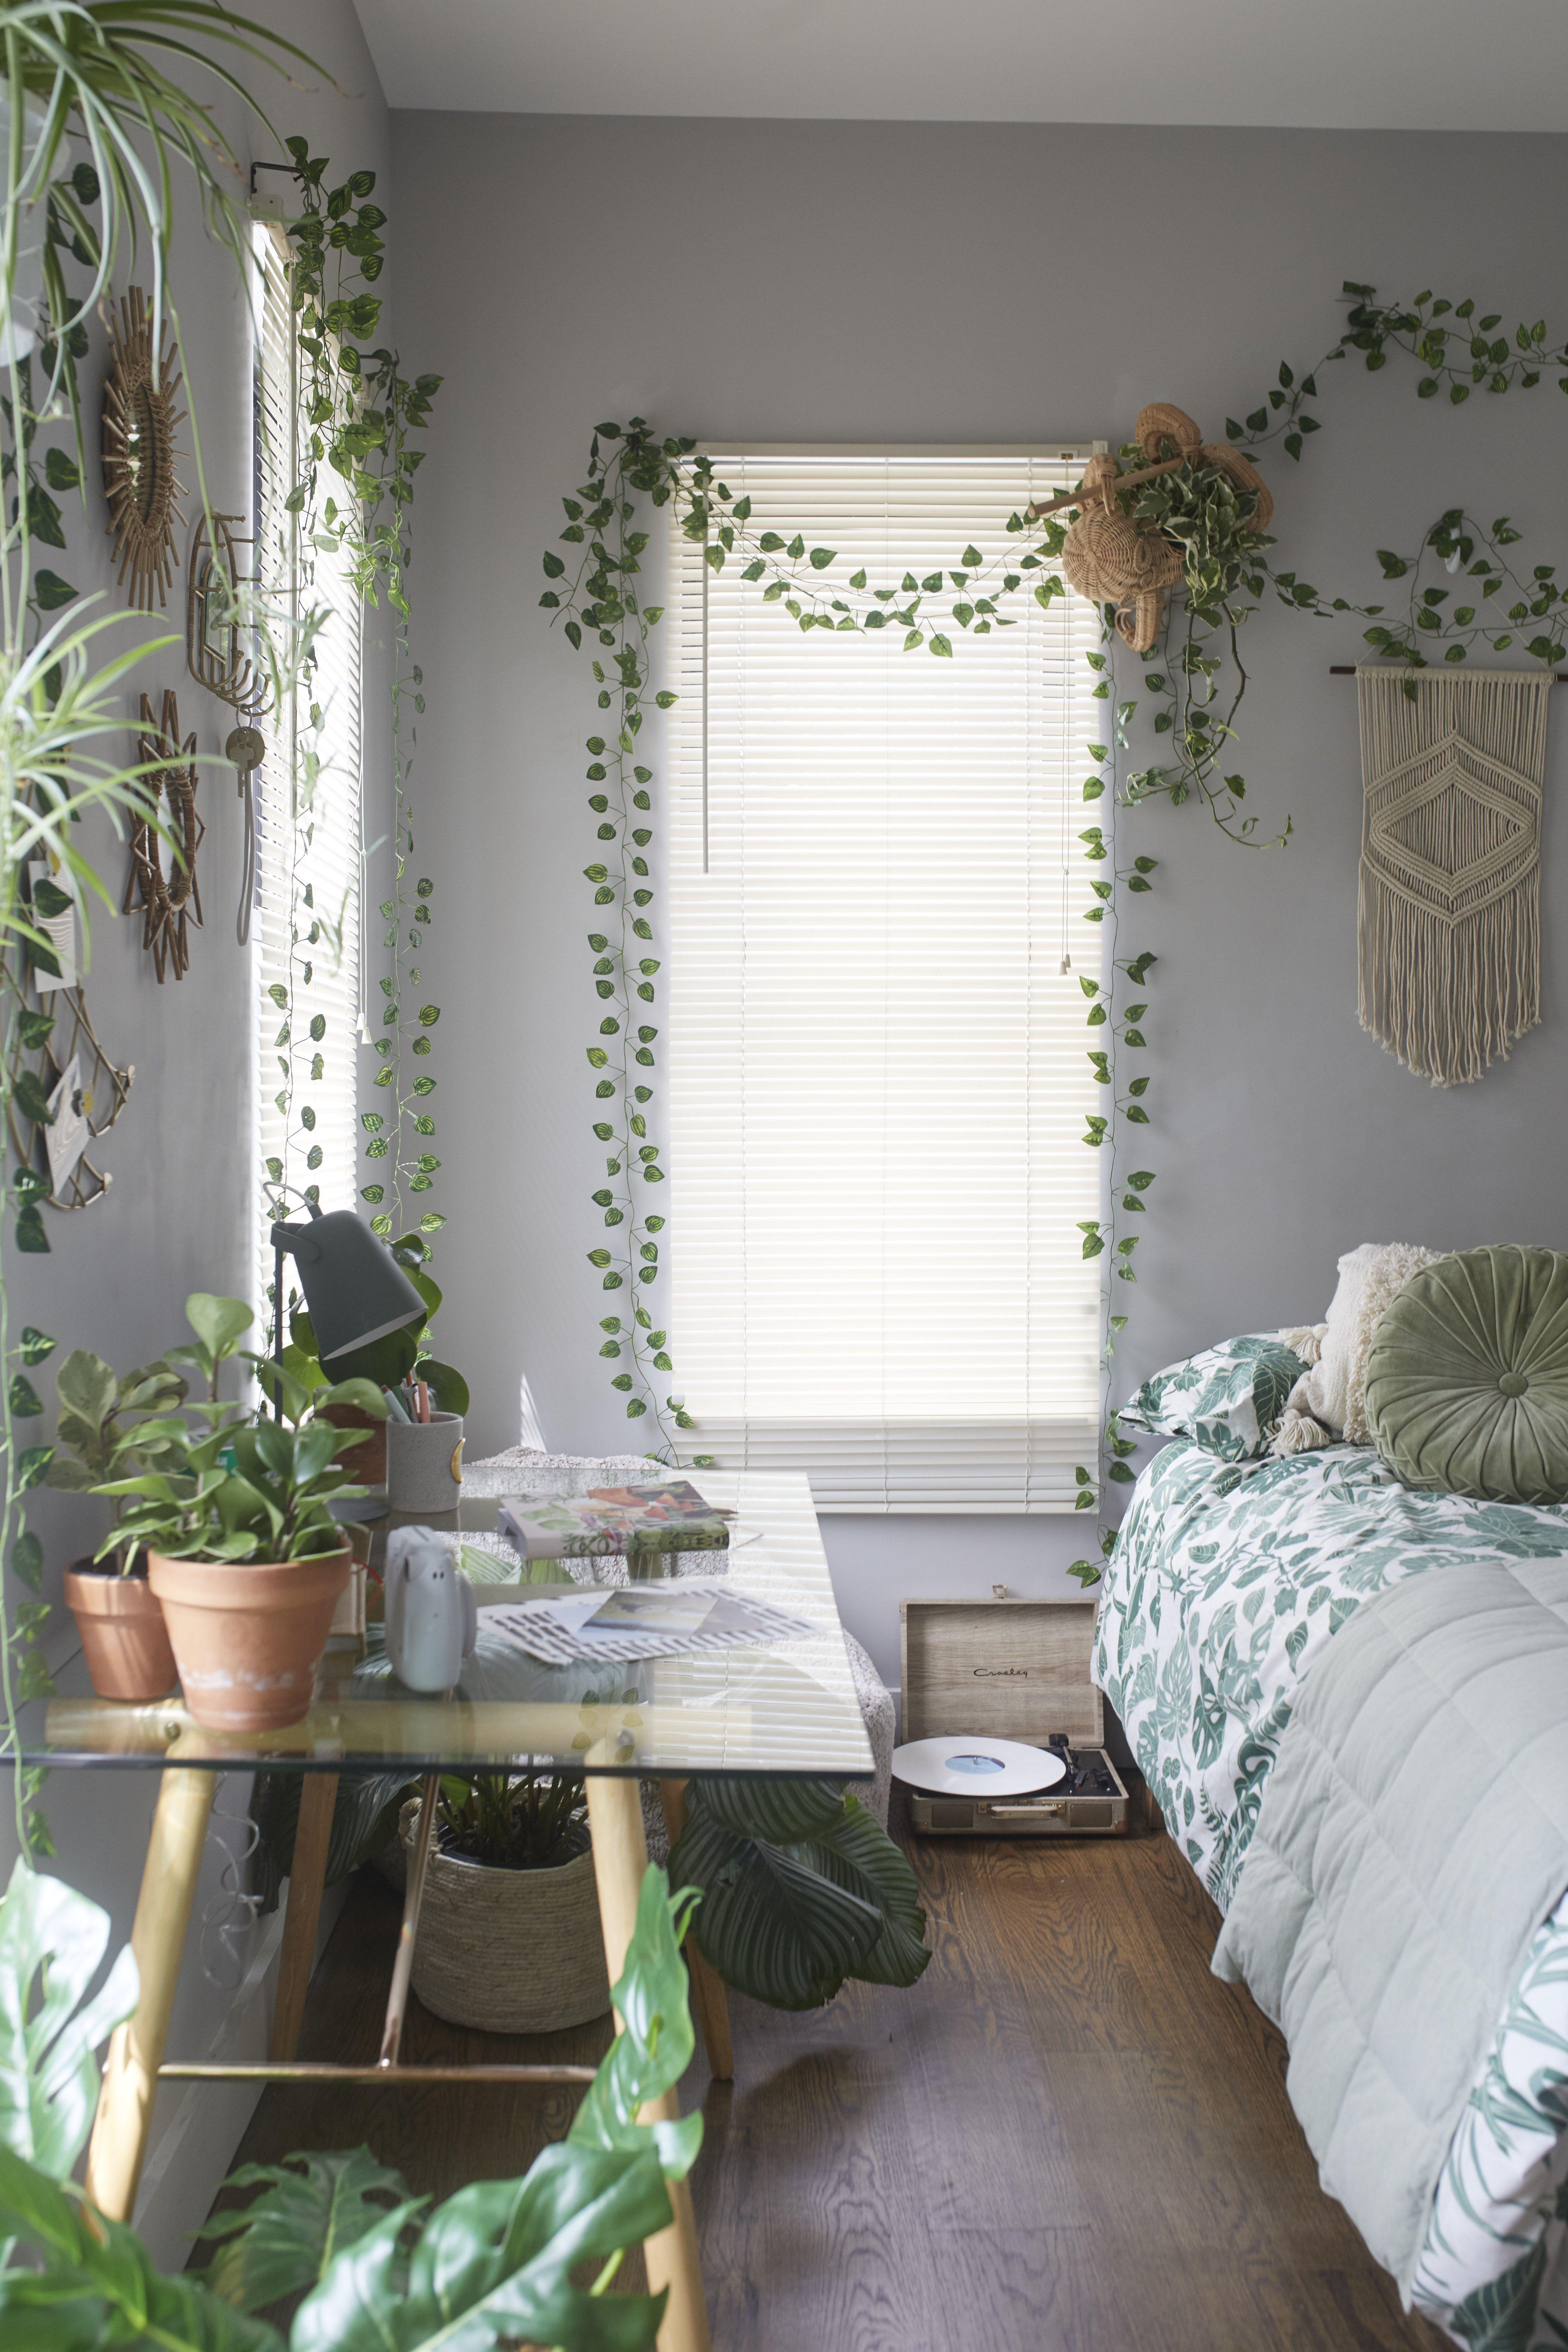 Jungle Duvet Set Aesthetic Room Decor Room Ideas Bedroom